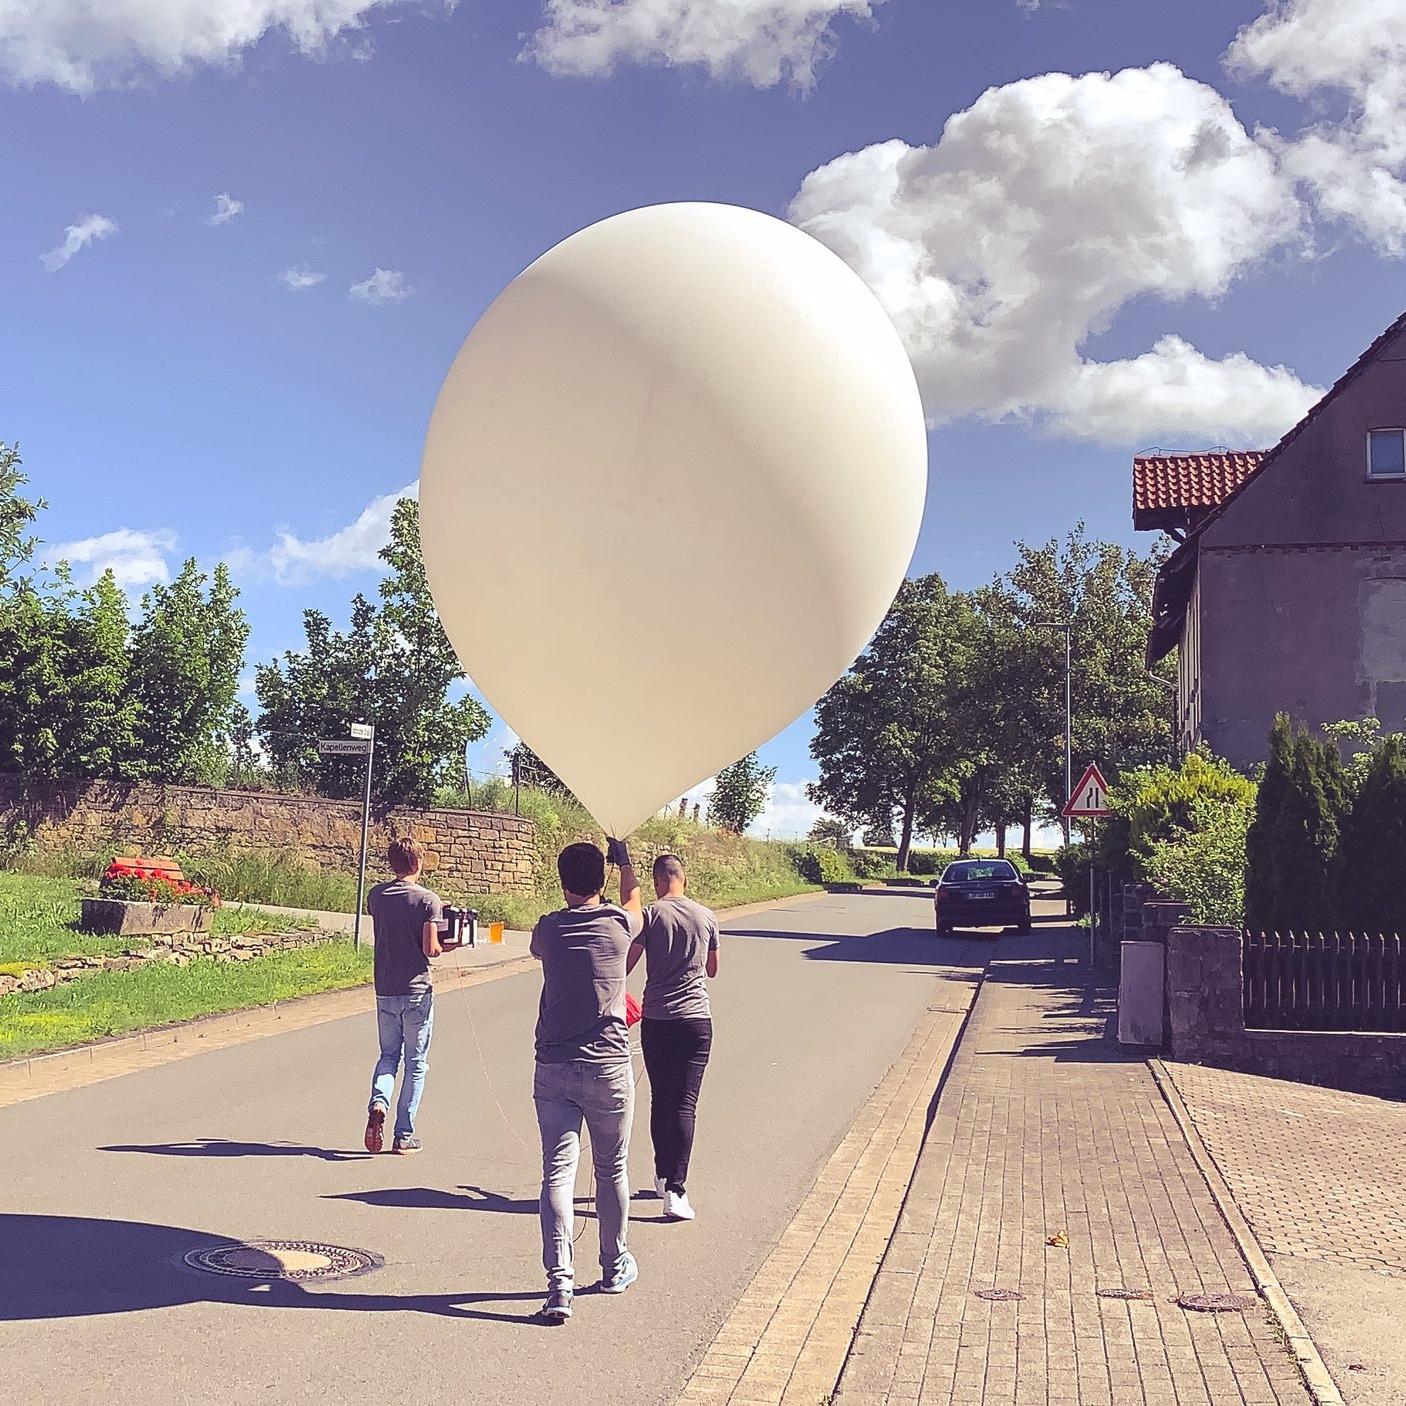 The balloon, ready to take off